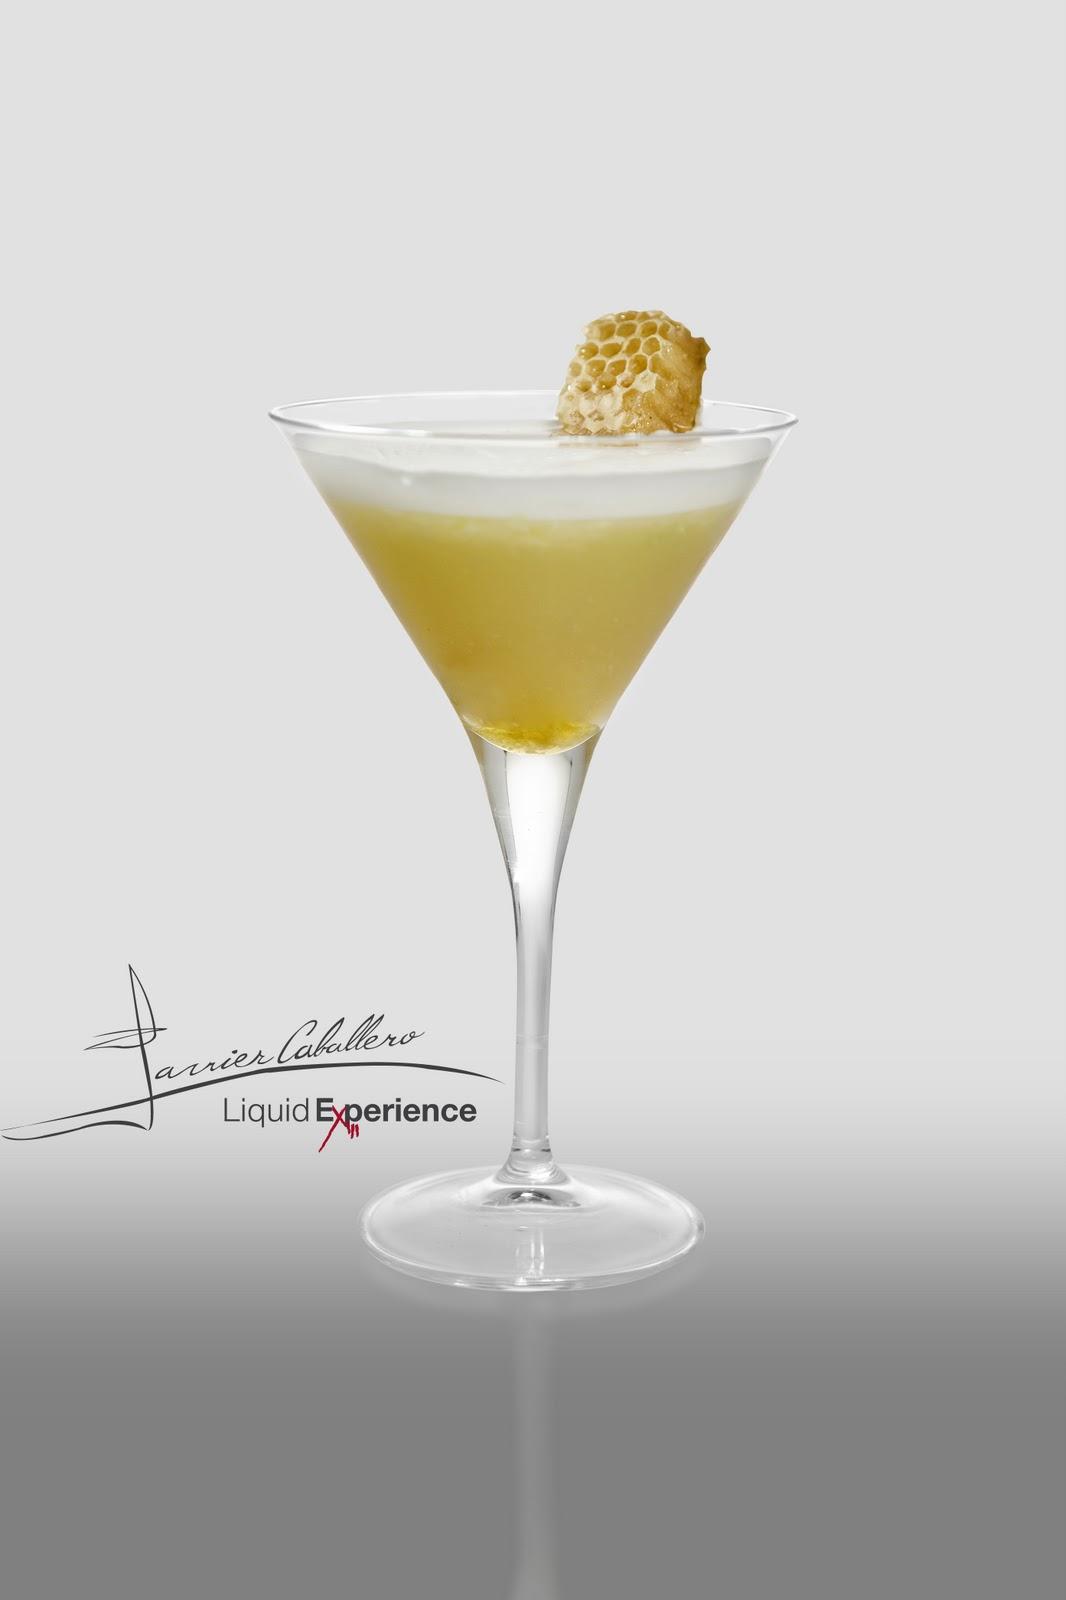 Liquid experience por javier caballero un c ctel dentro for Cocktail whisky miel